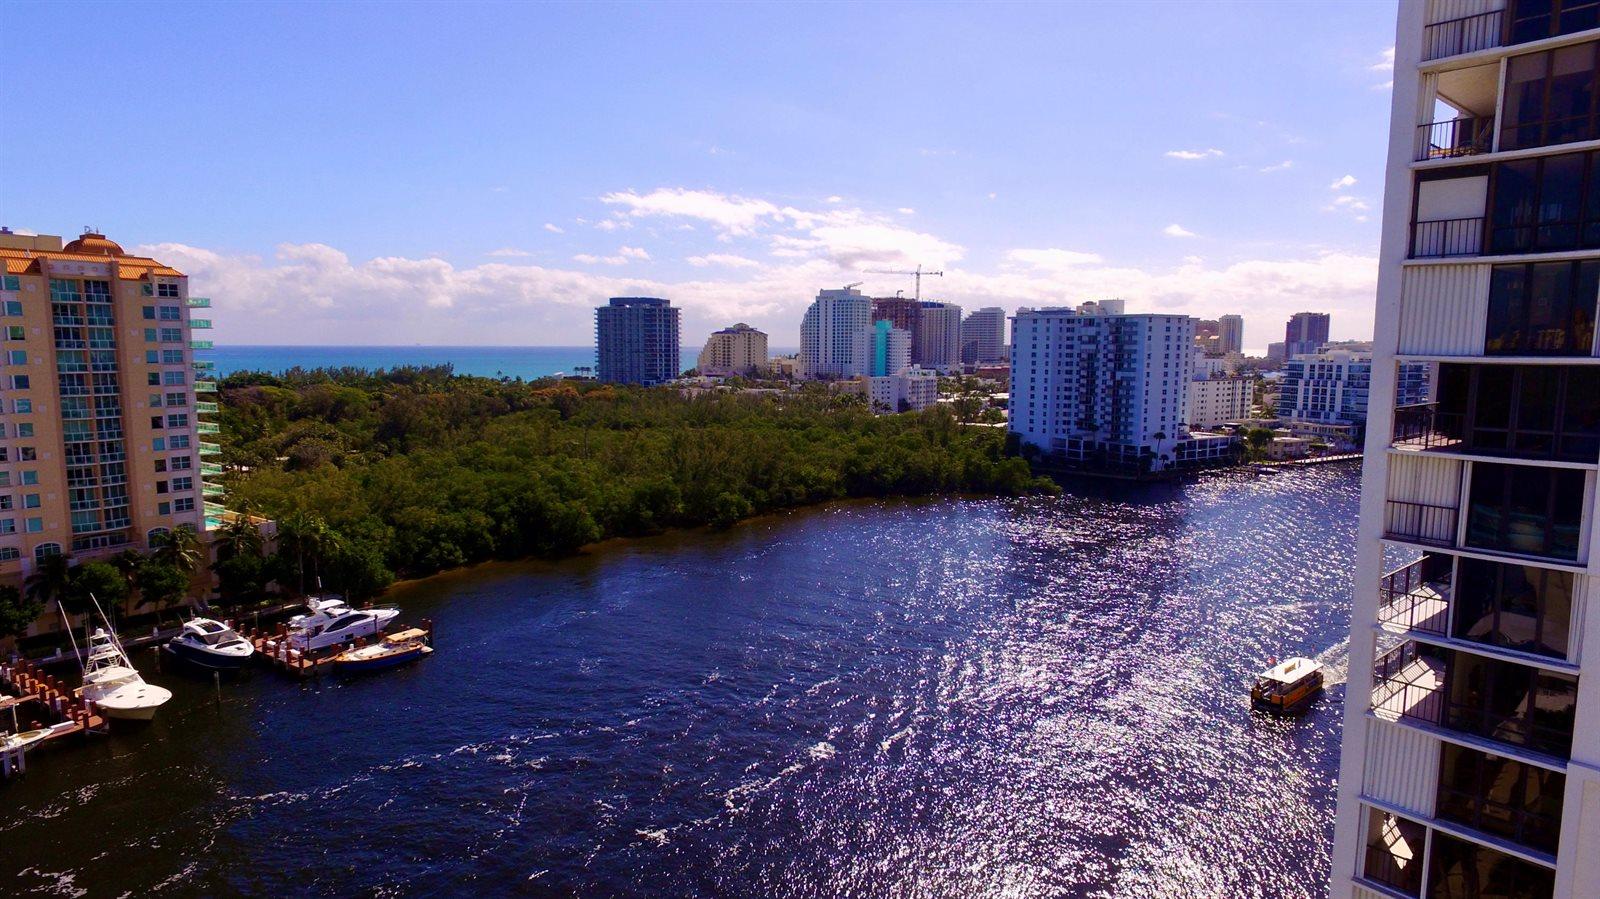 2670 East Sunrise Boulevard, #1401, Fort Lauderdale, FL 33304